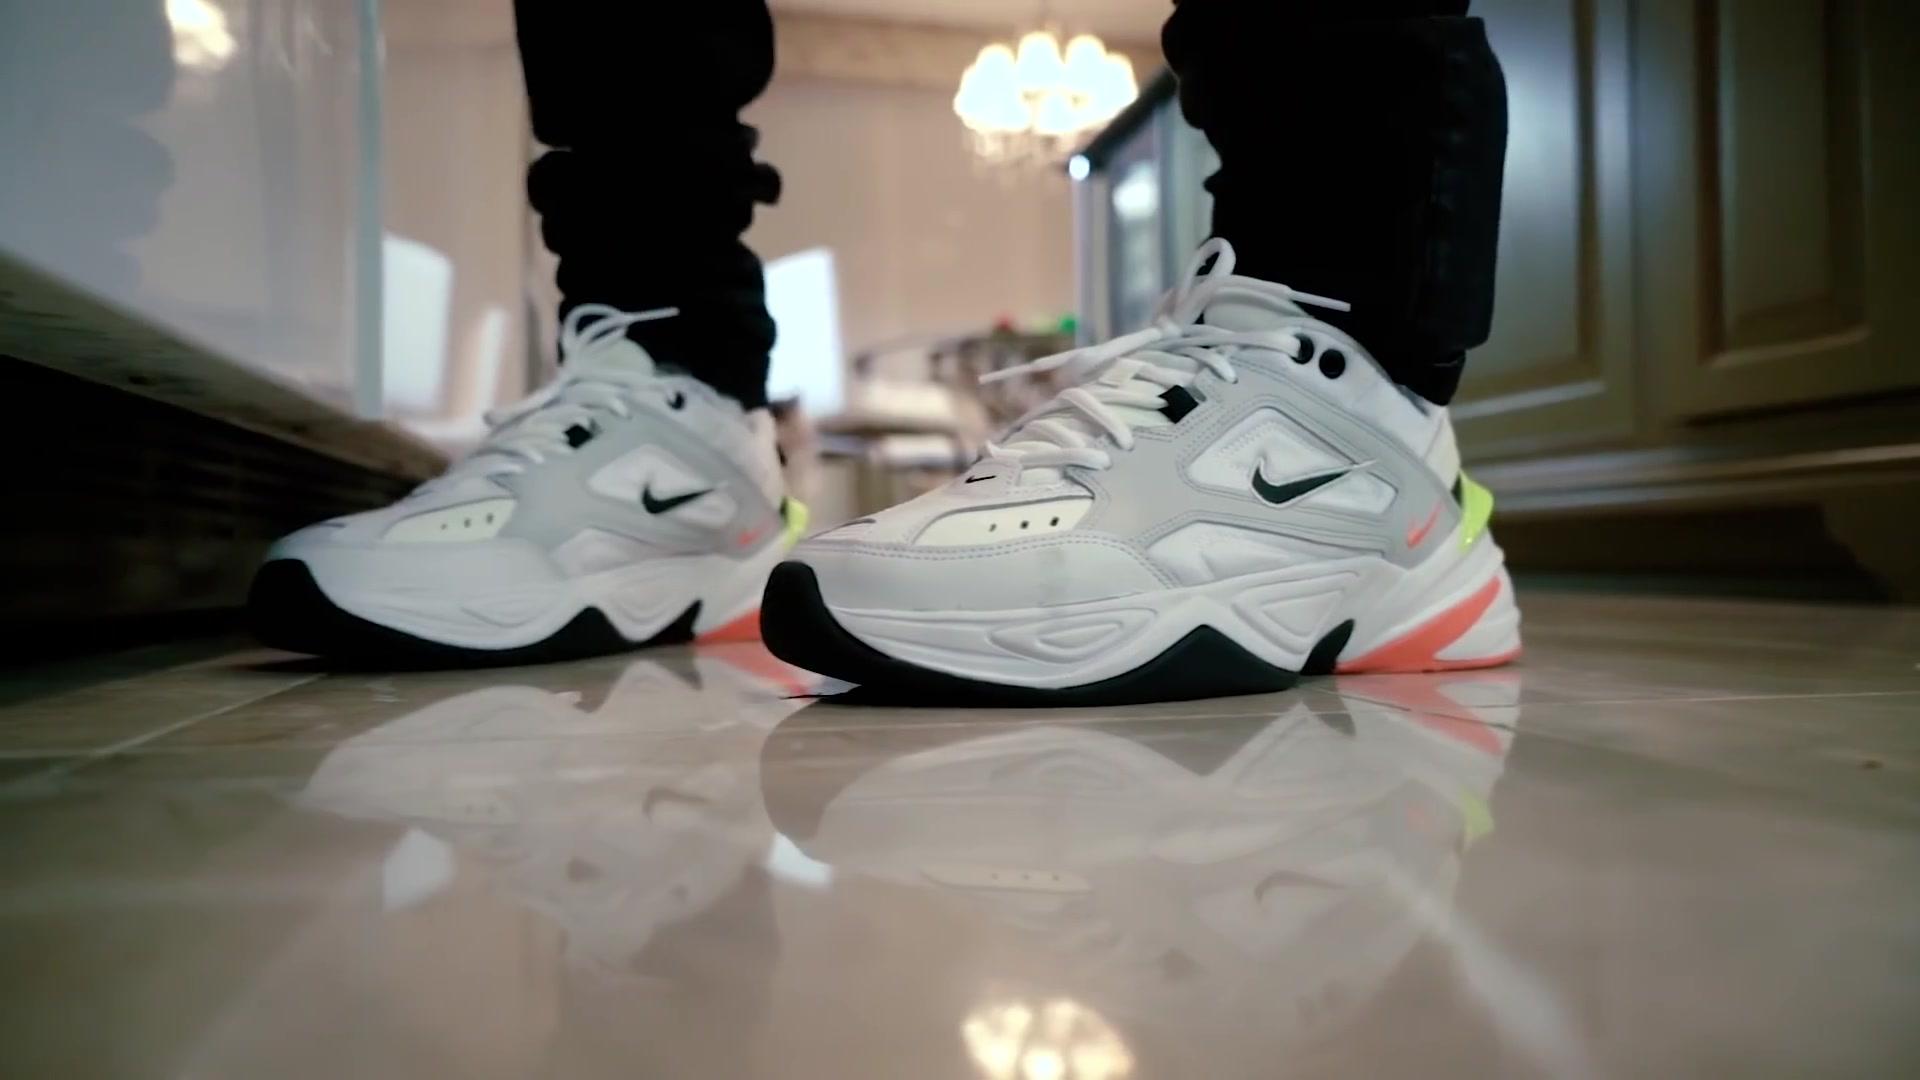 Nike M2K Tekno Men's Sneakers Worn by